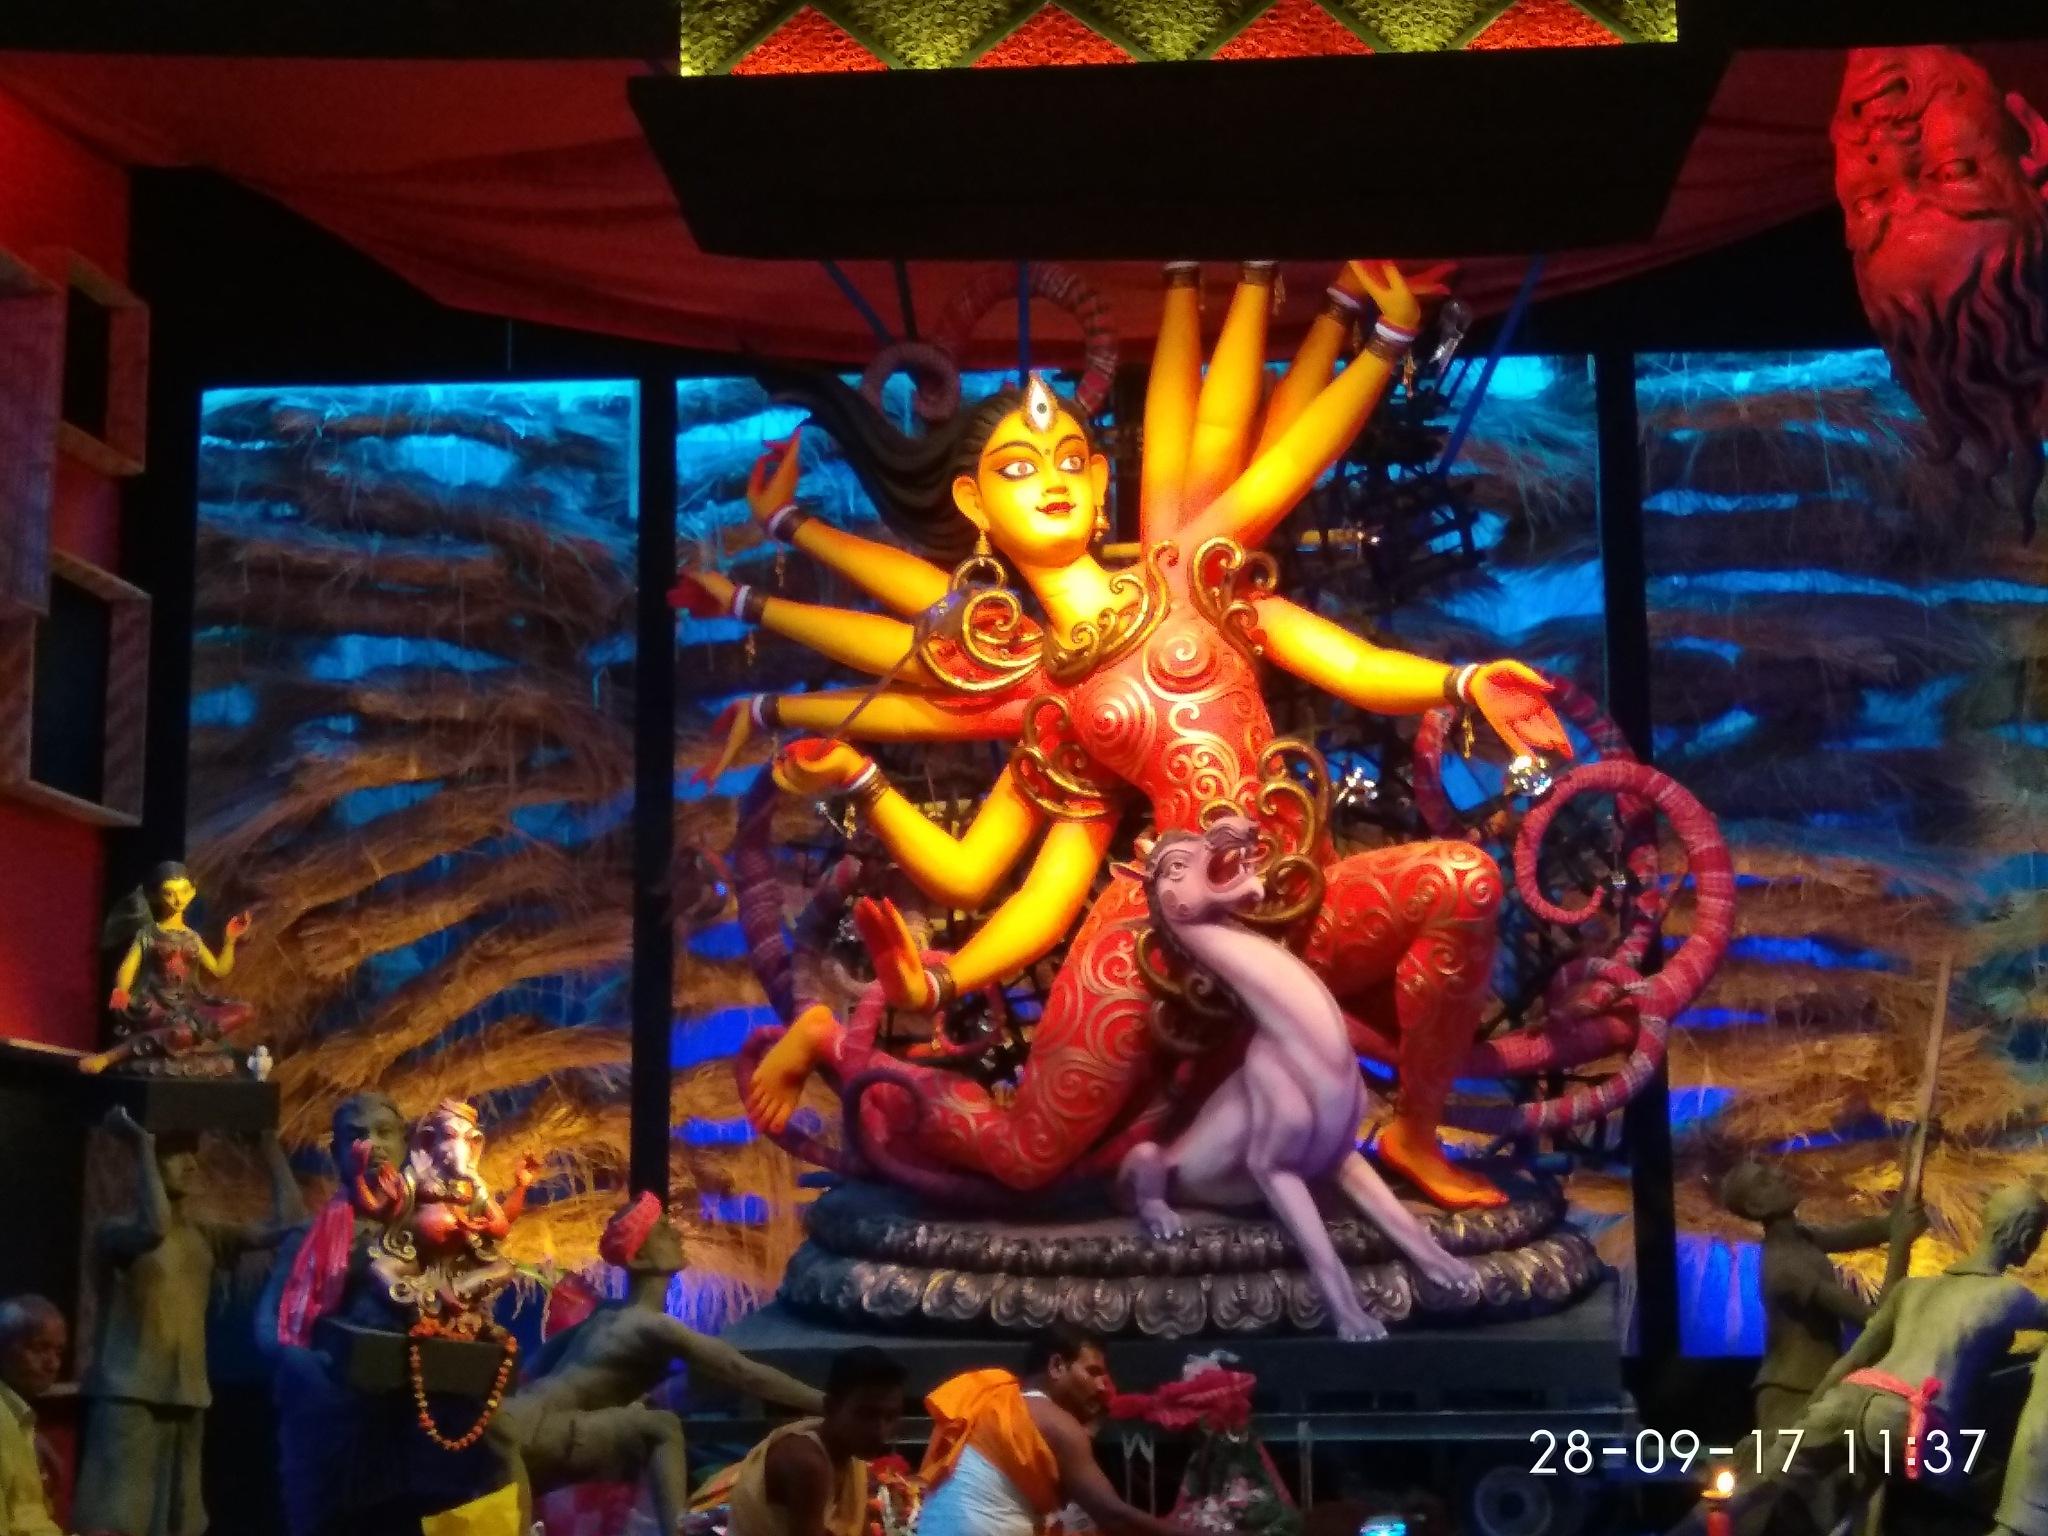 Durga Pratima by Dibyendu Chatterjii